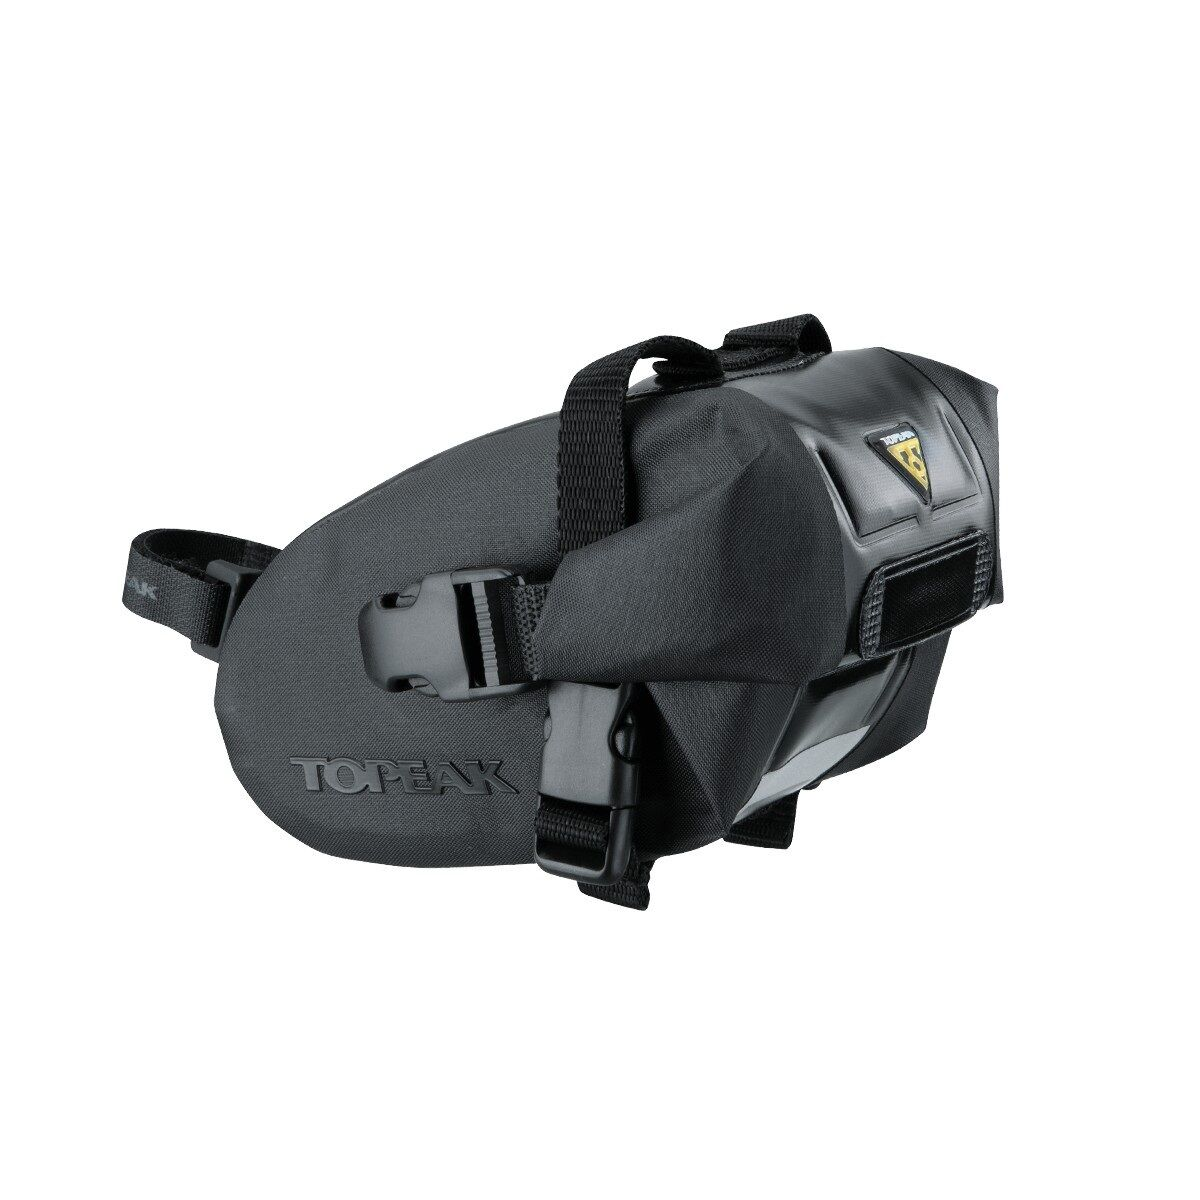 Topeak TT9817B Wedge Drybag   Bike Cycling Saddle Seat Bag Pannier - Small